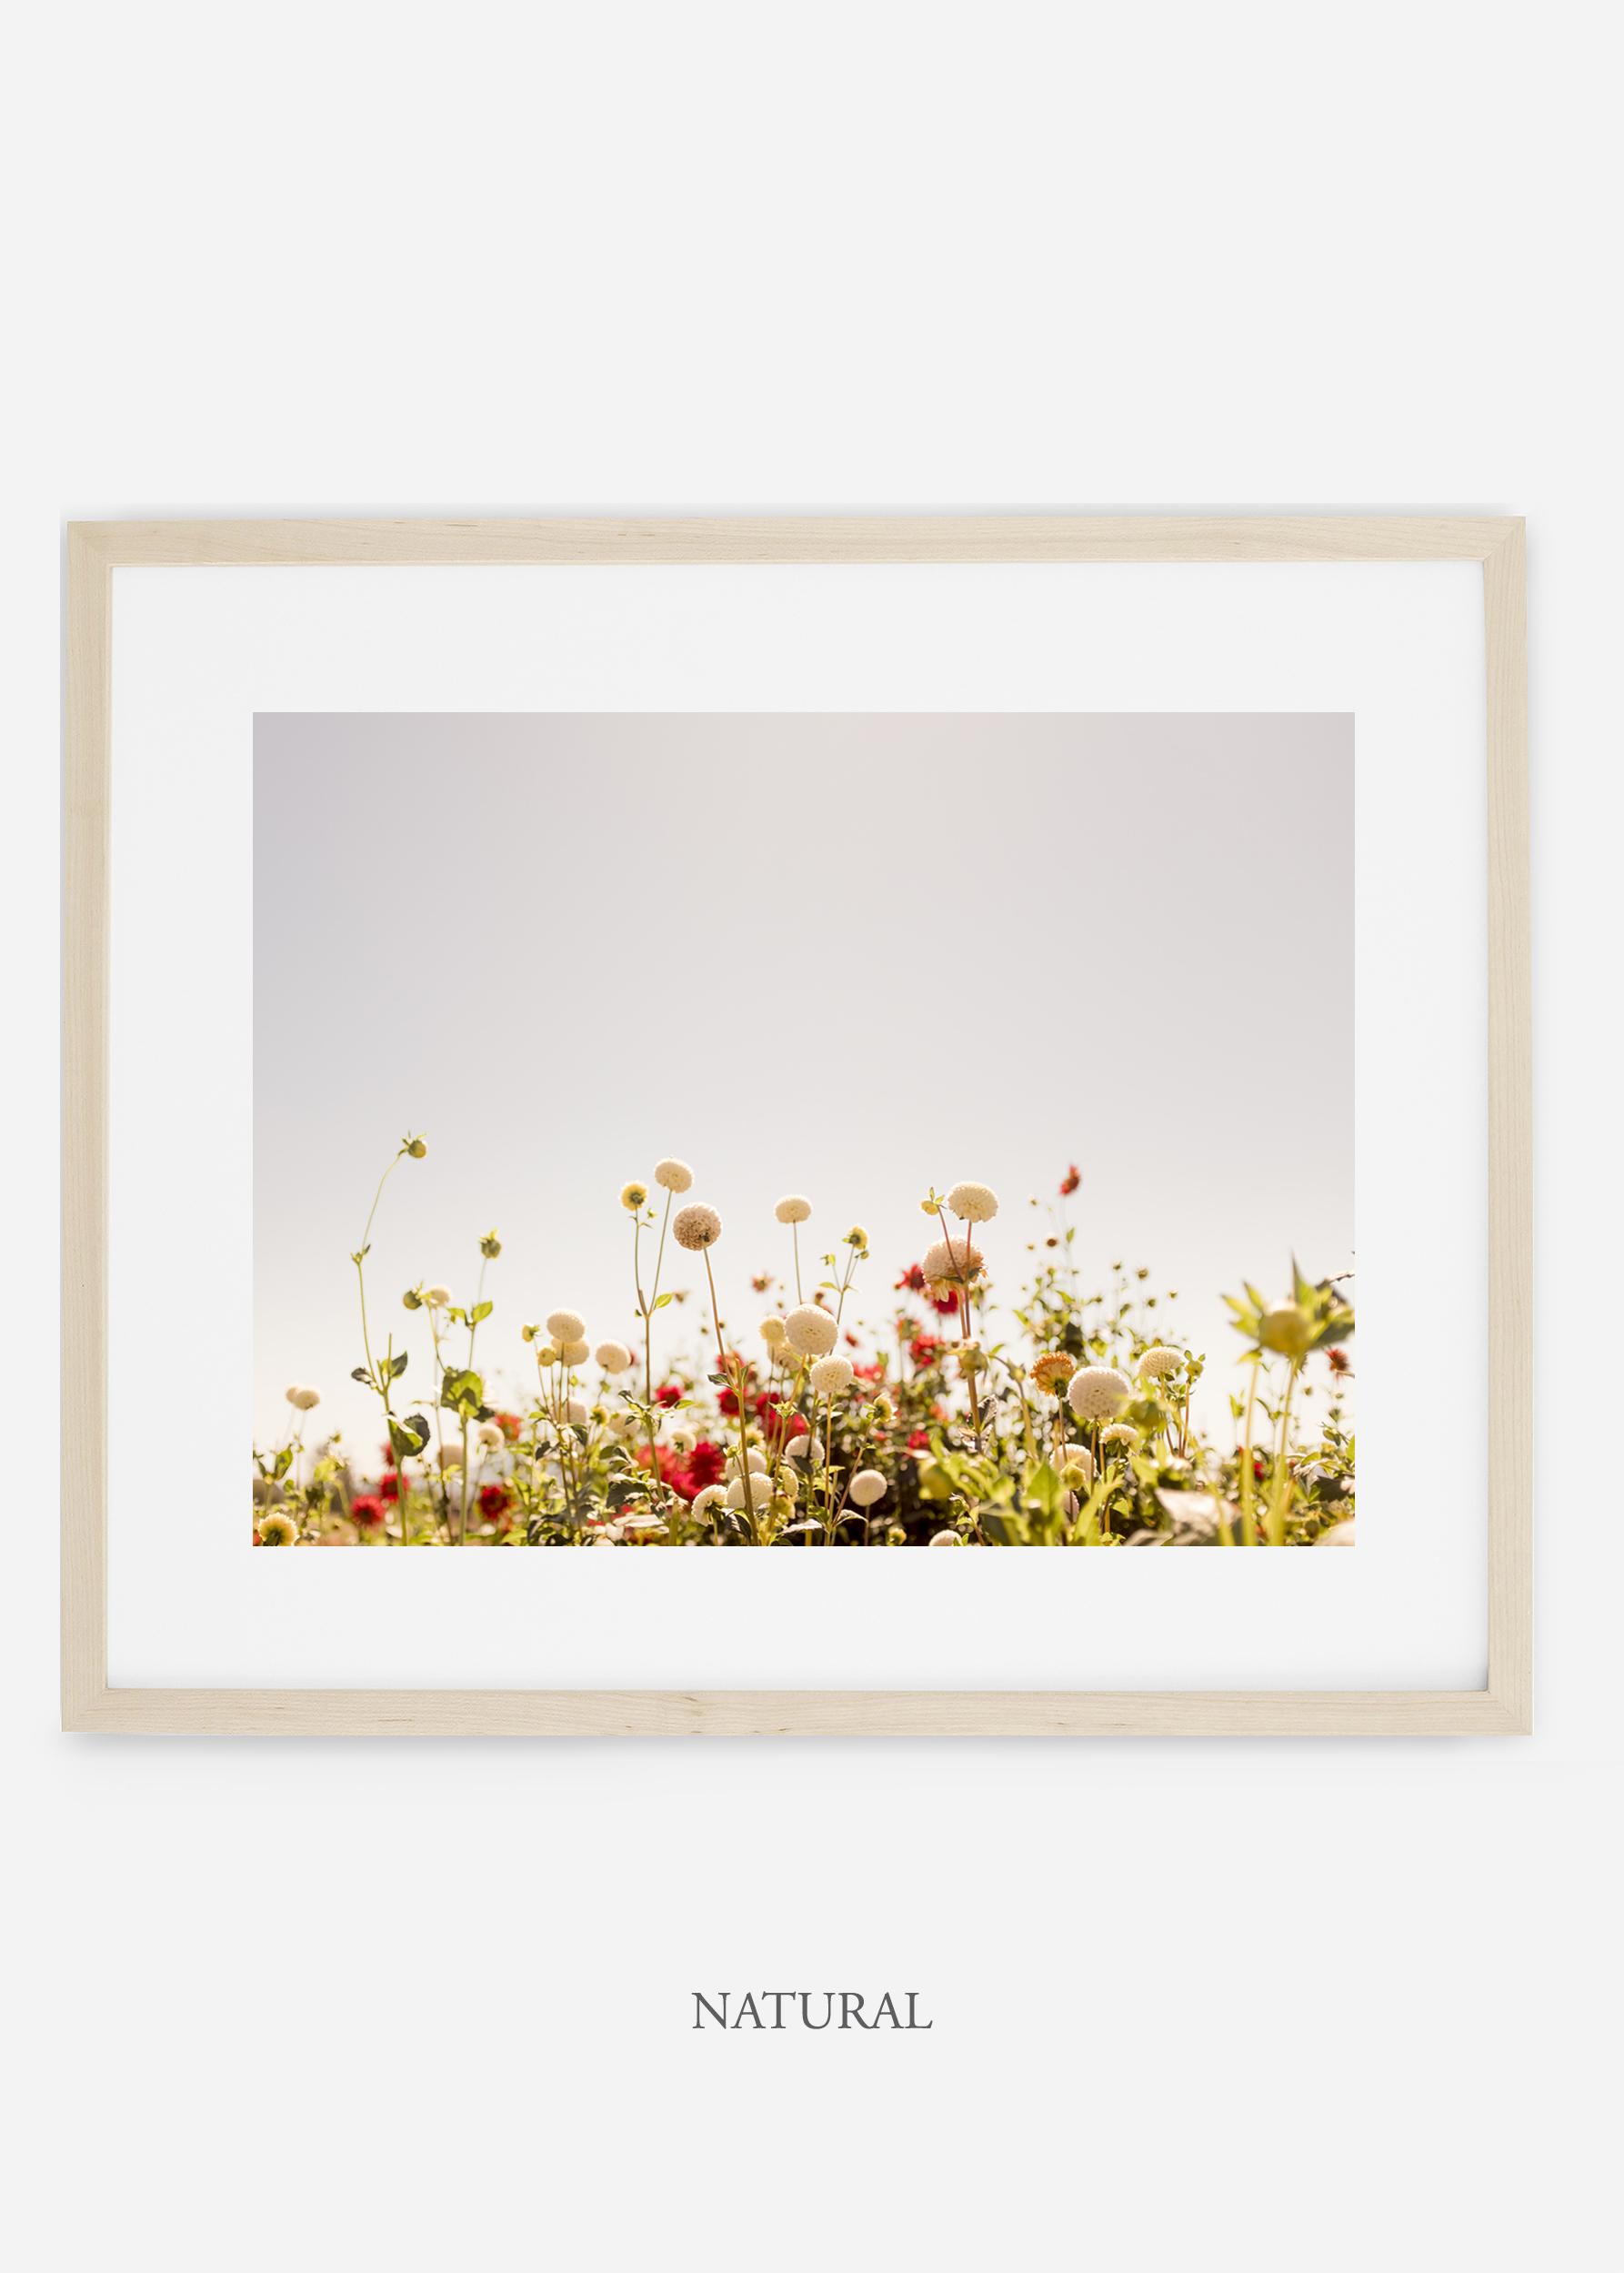 wilder-california-naturalframe-dahlia-5-minimal-botanical-print-art-interior-design.jpg